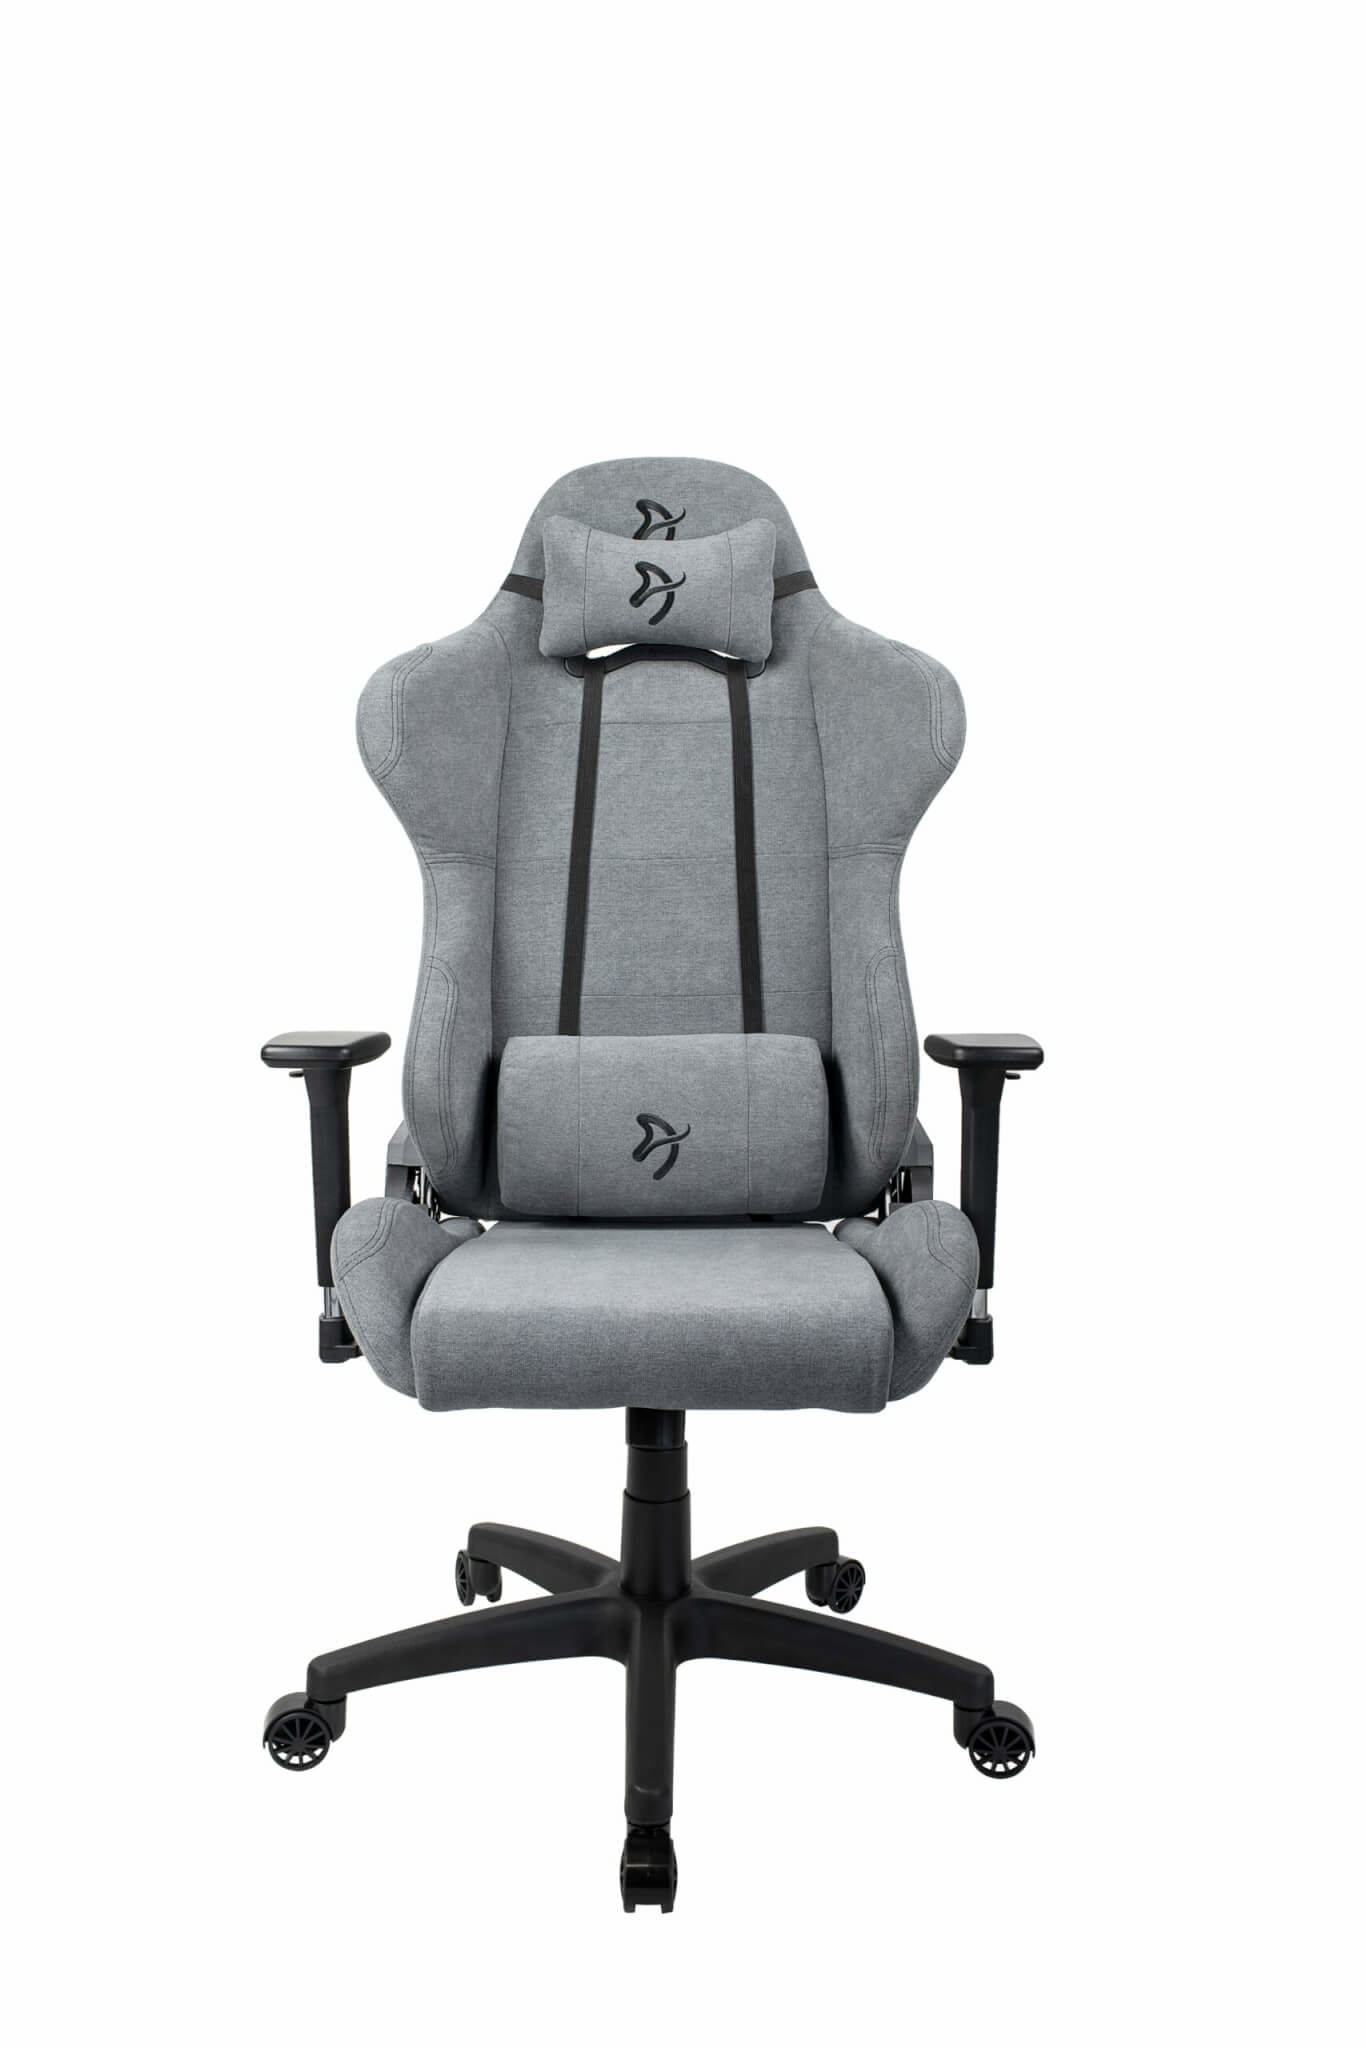 Arozzi Torretta -SFB-ASH - PC-Gamingstuhl - PC - 100 kg - Gepolsterter - ausgestopfter Sitz - Gepolsterte Rückenlehne - Metall